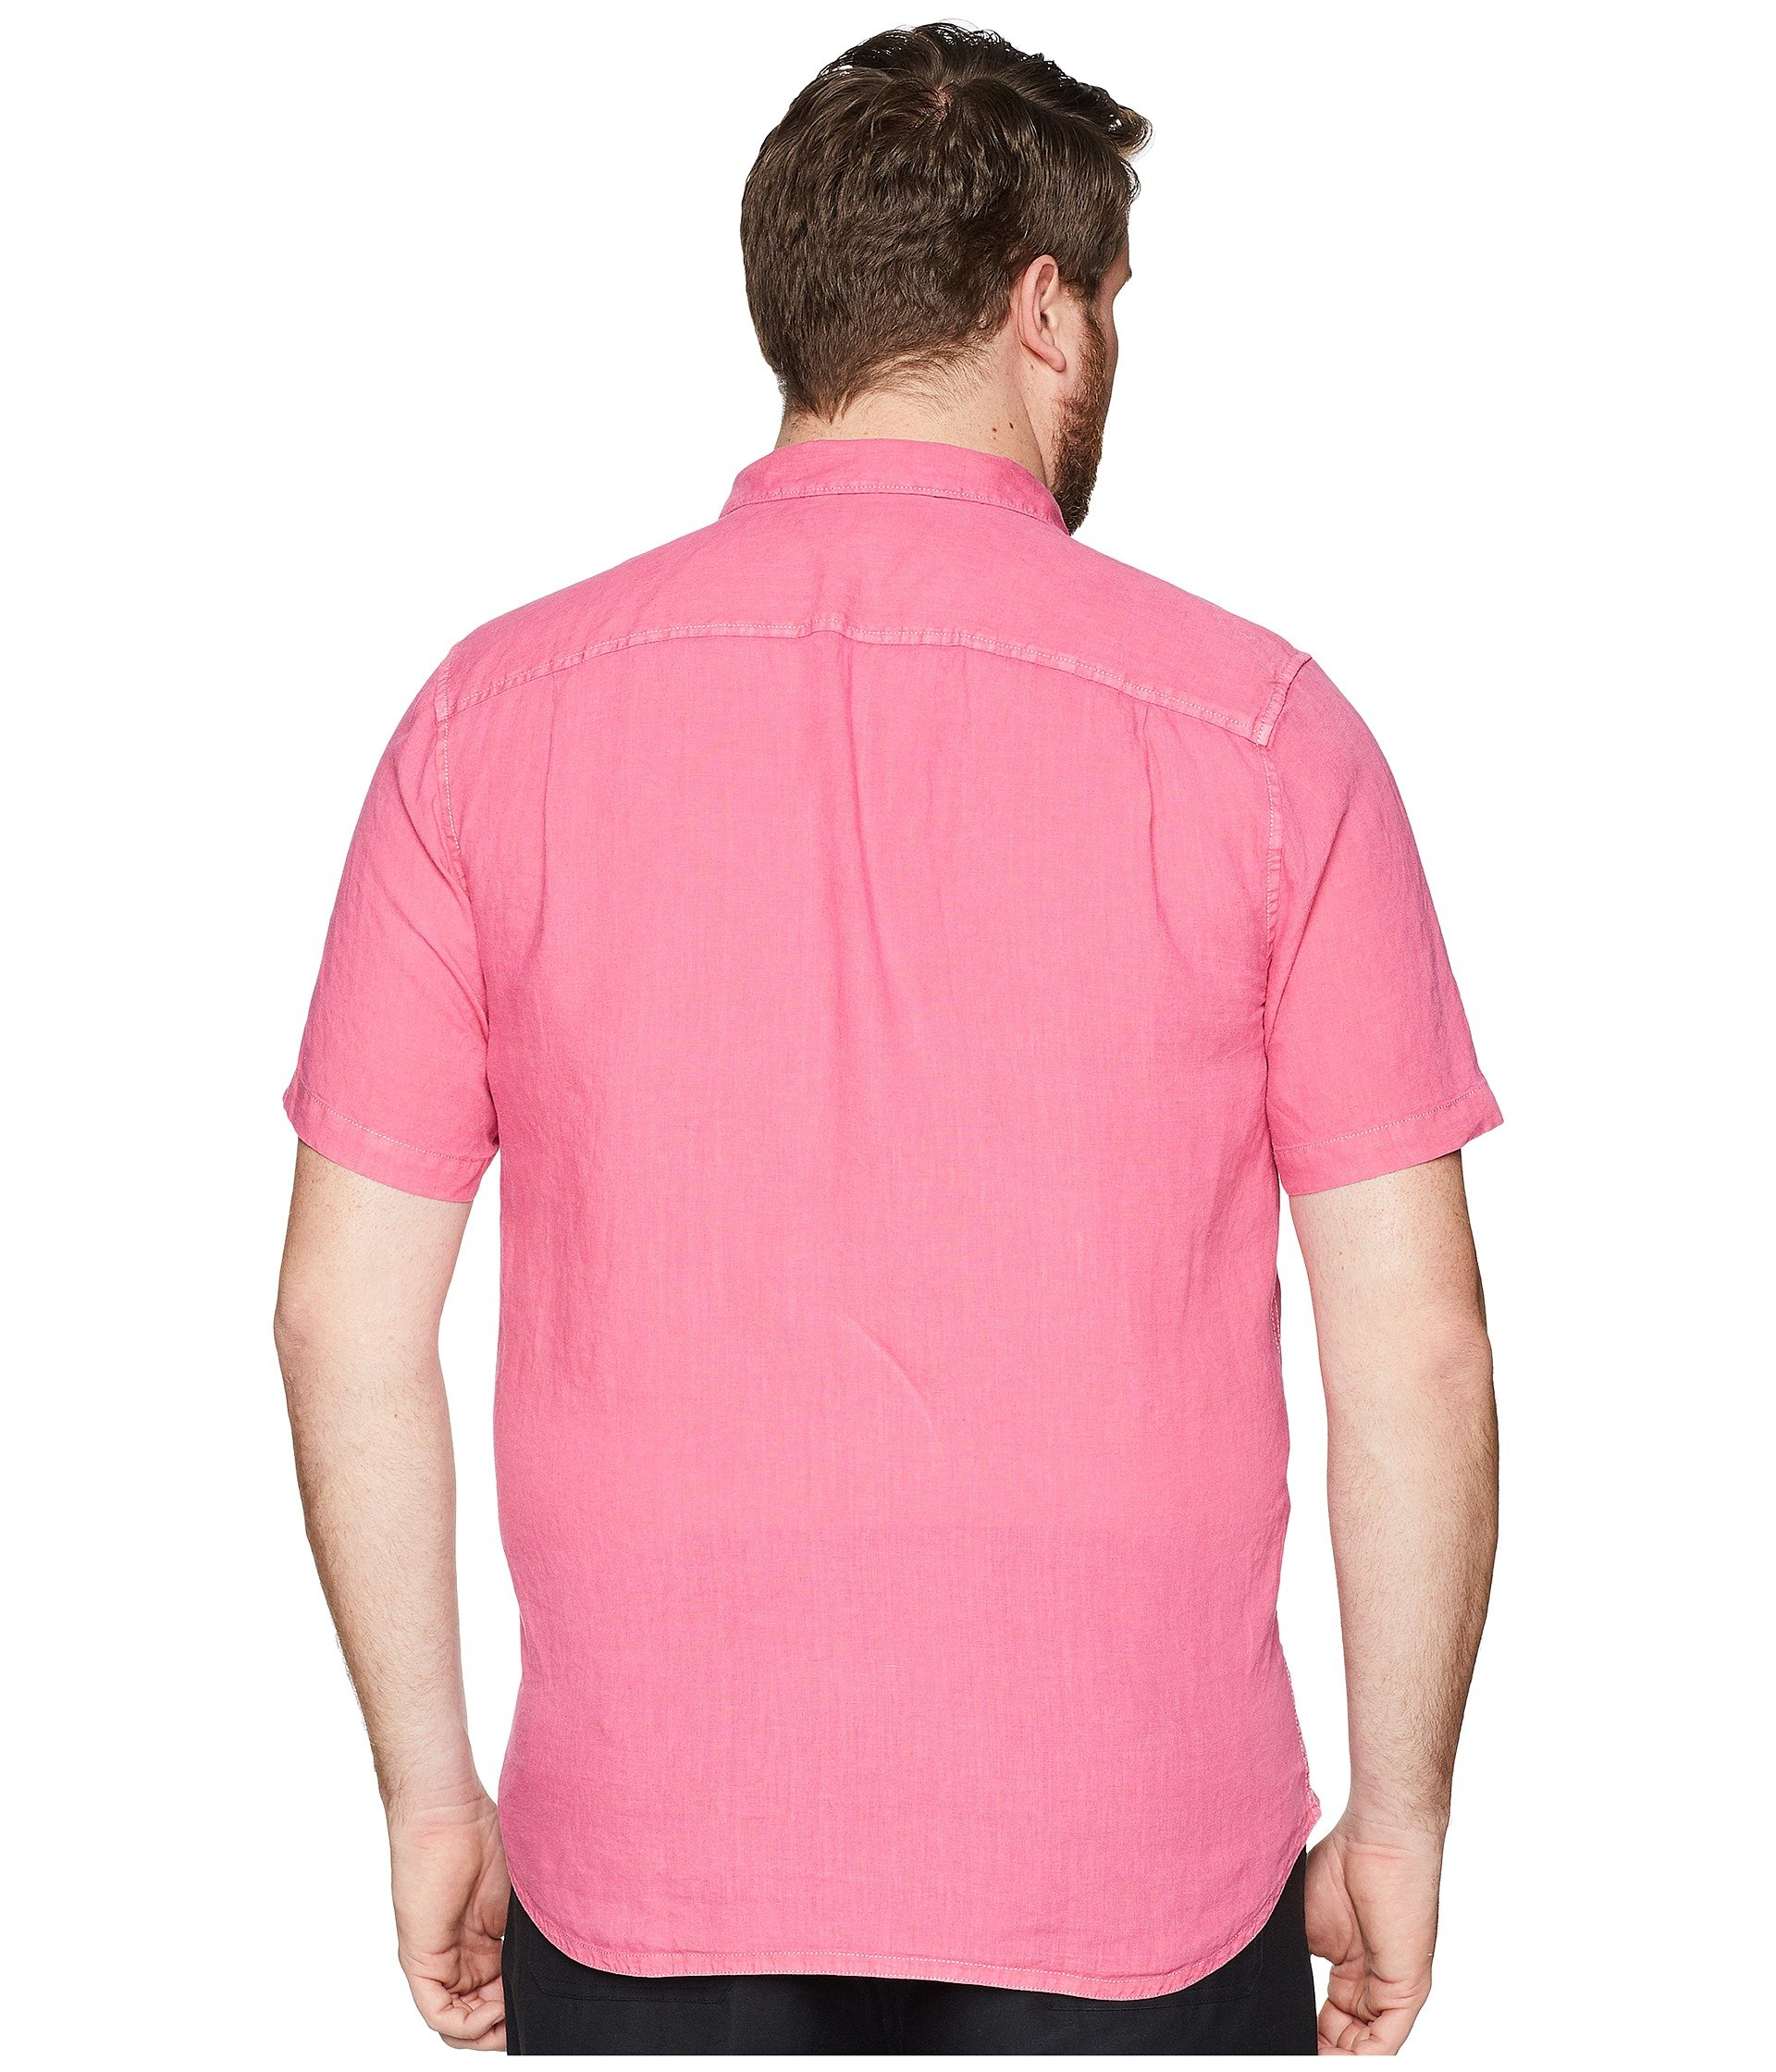 Big Sea Breezer amp; Rose Sleeve Short Tall Shirt Glass Bahama Bright Tommy YxwqUU